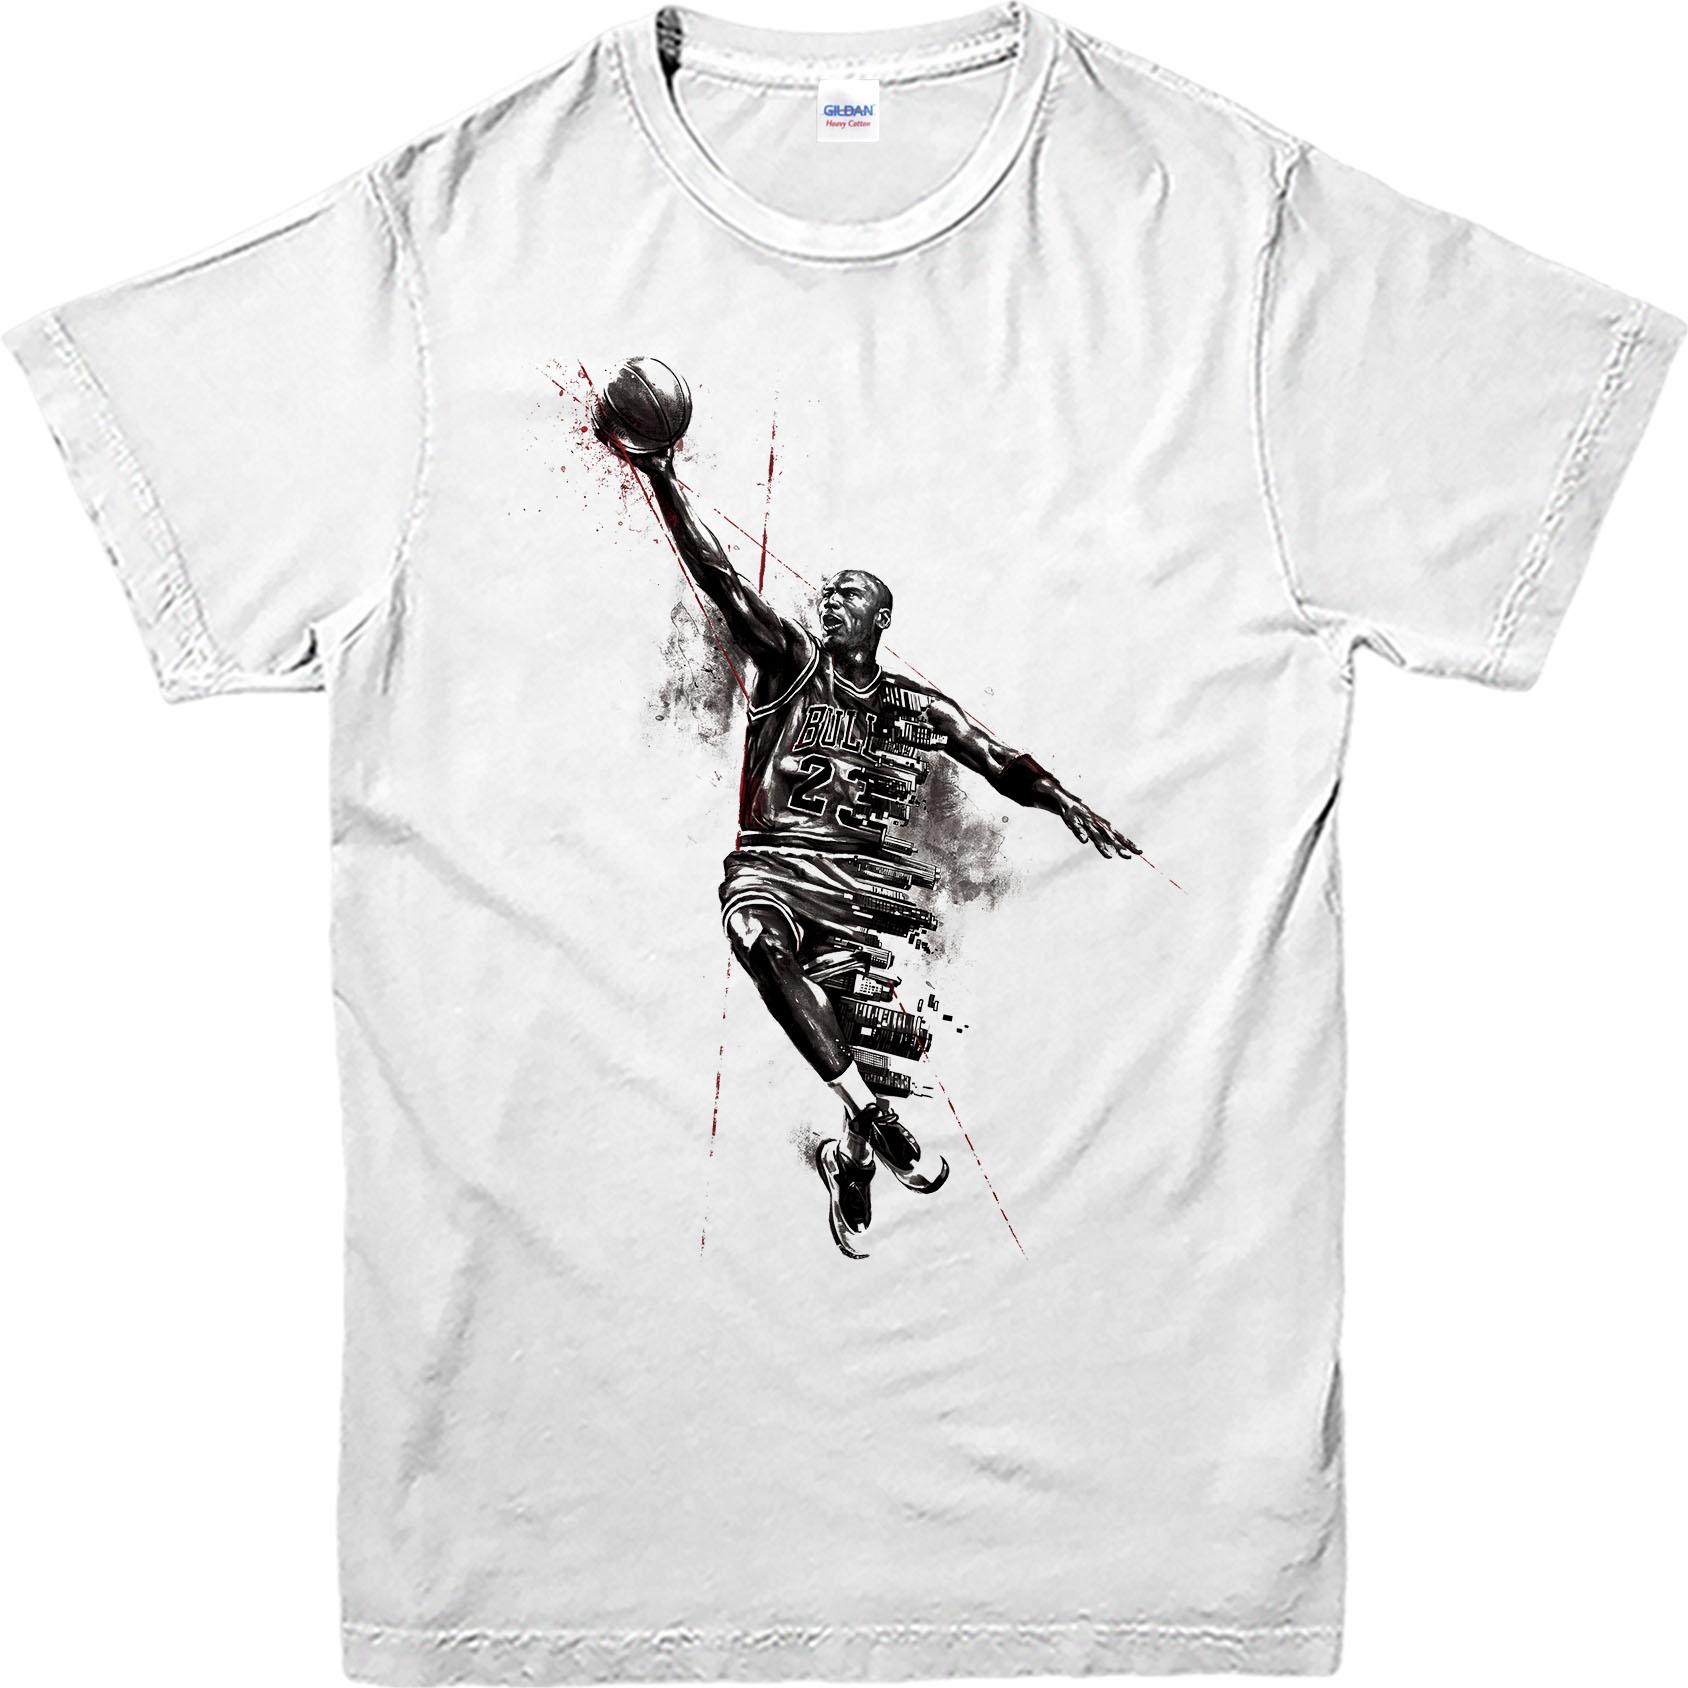 T shirt design jordan - Michael Jordan T Shirt Basketball Jordan Logo Spoof